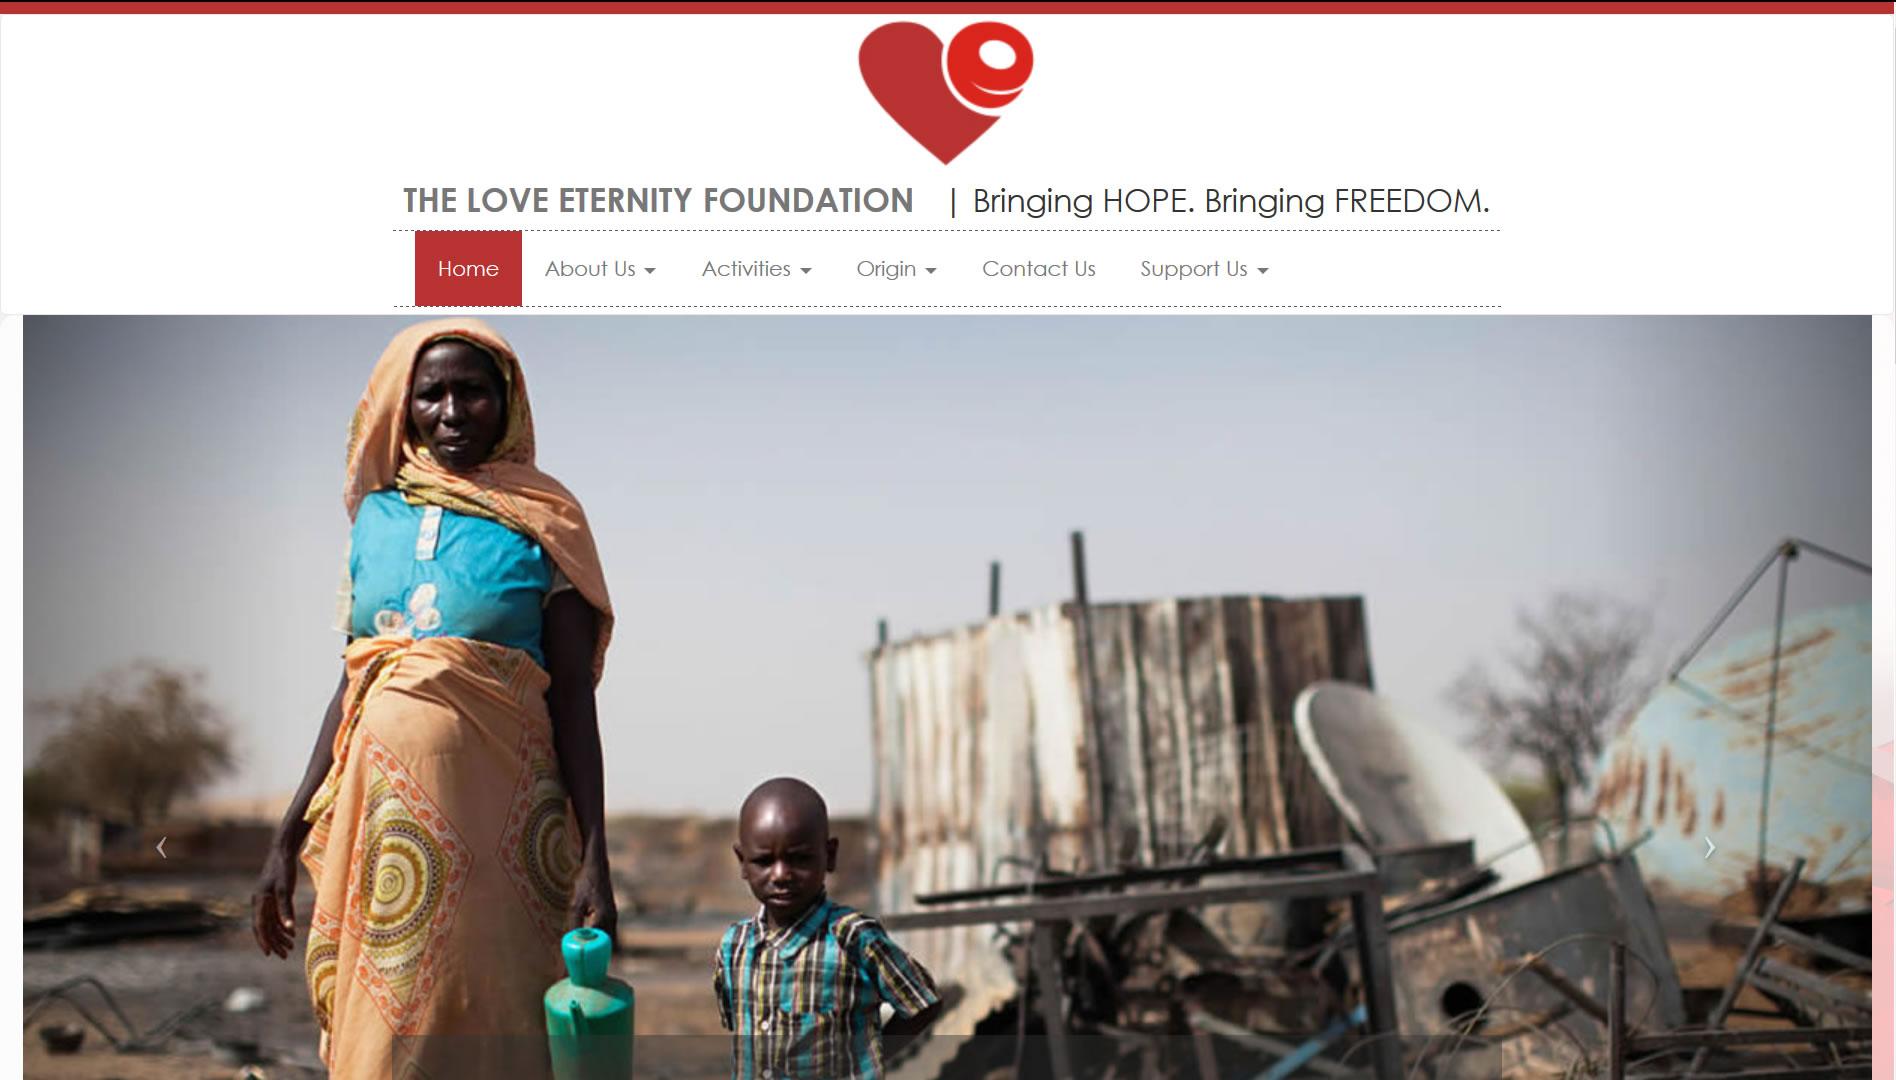 Love Eternity Foundation